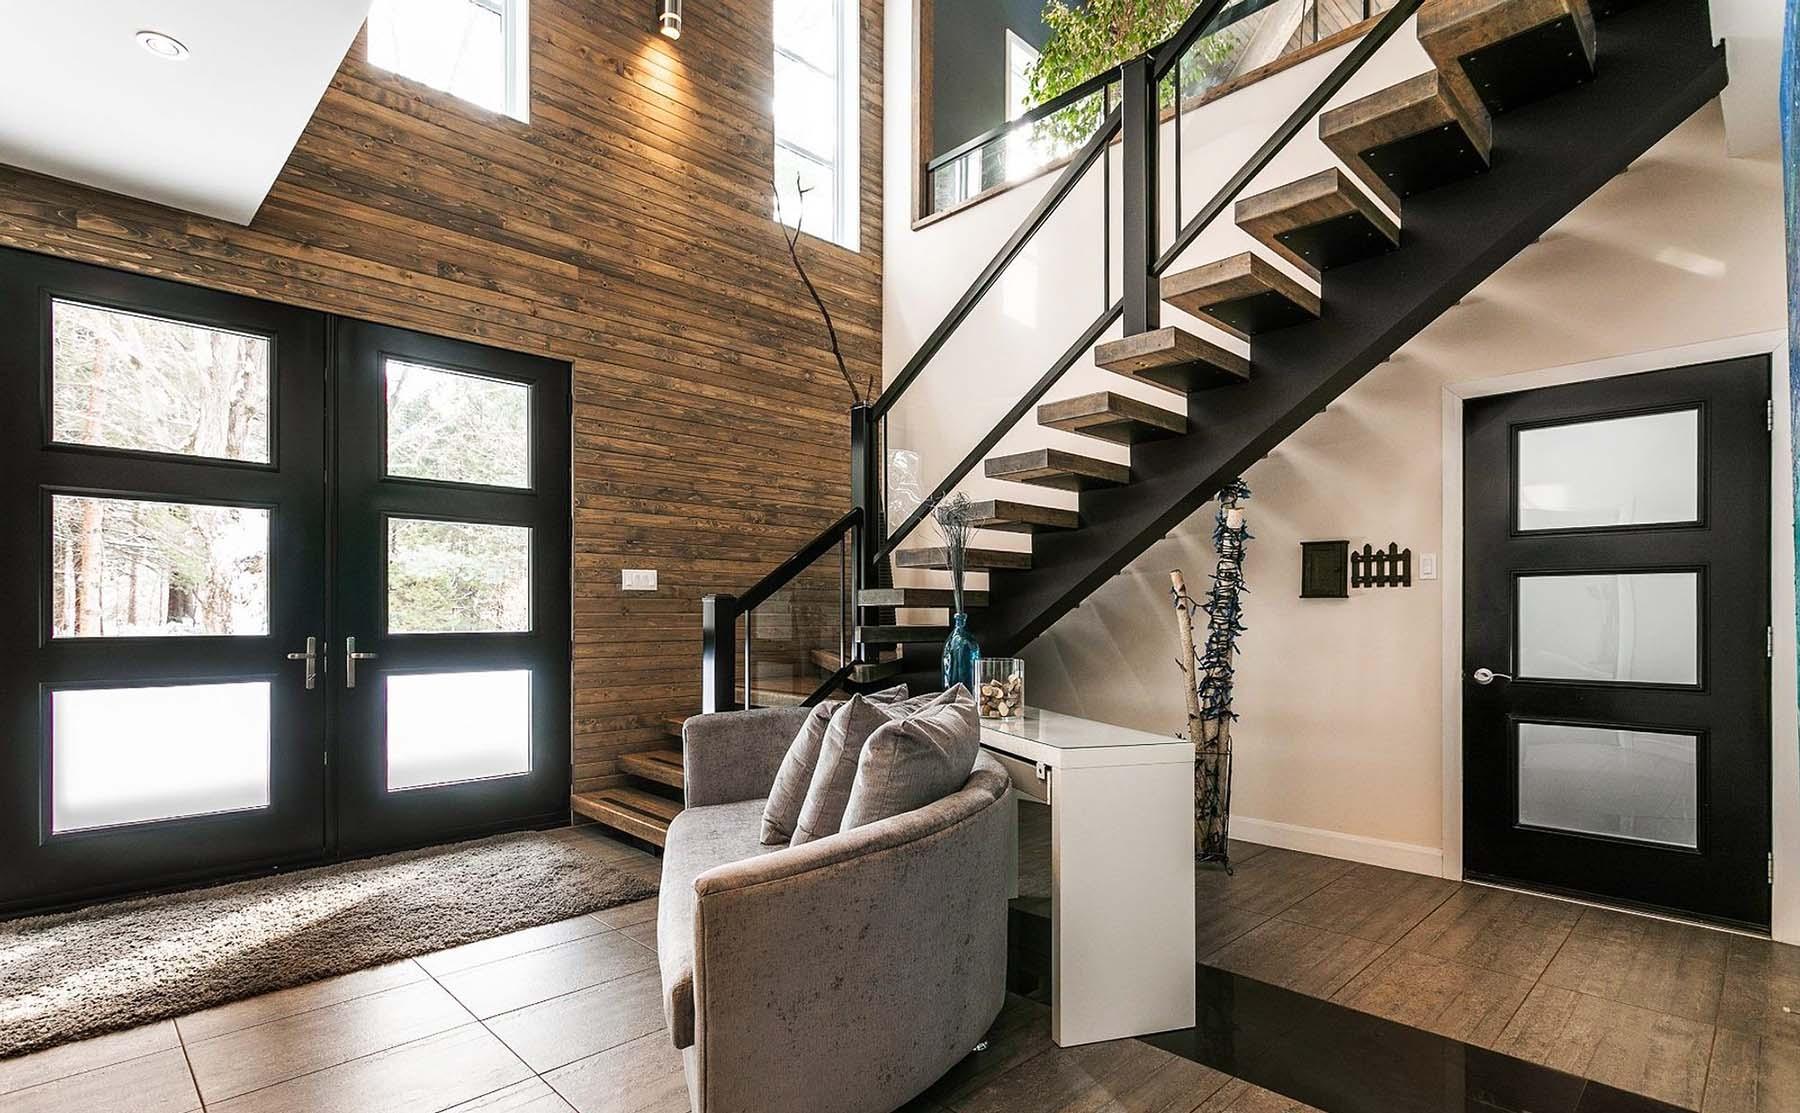 Beautiful modern staircase with black steel backbone frame and floating wood steps. Glass and black metal railings.